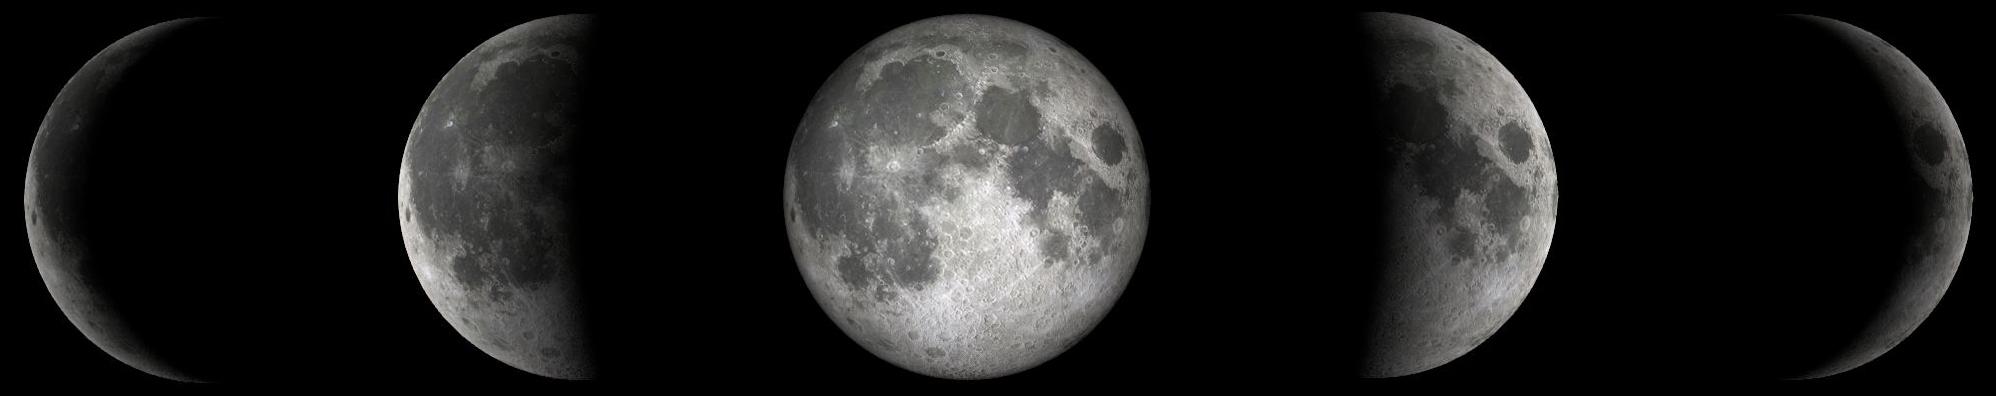 New Azure Moon.jpg